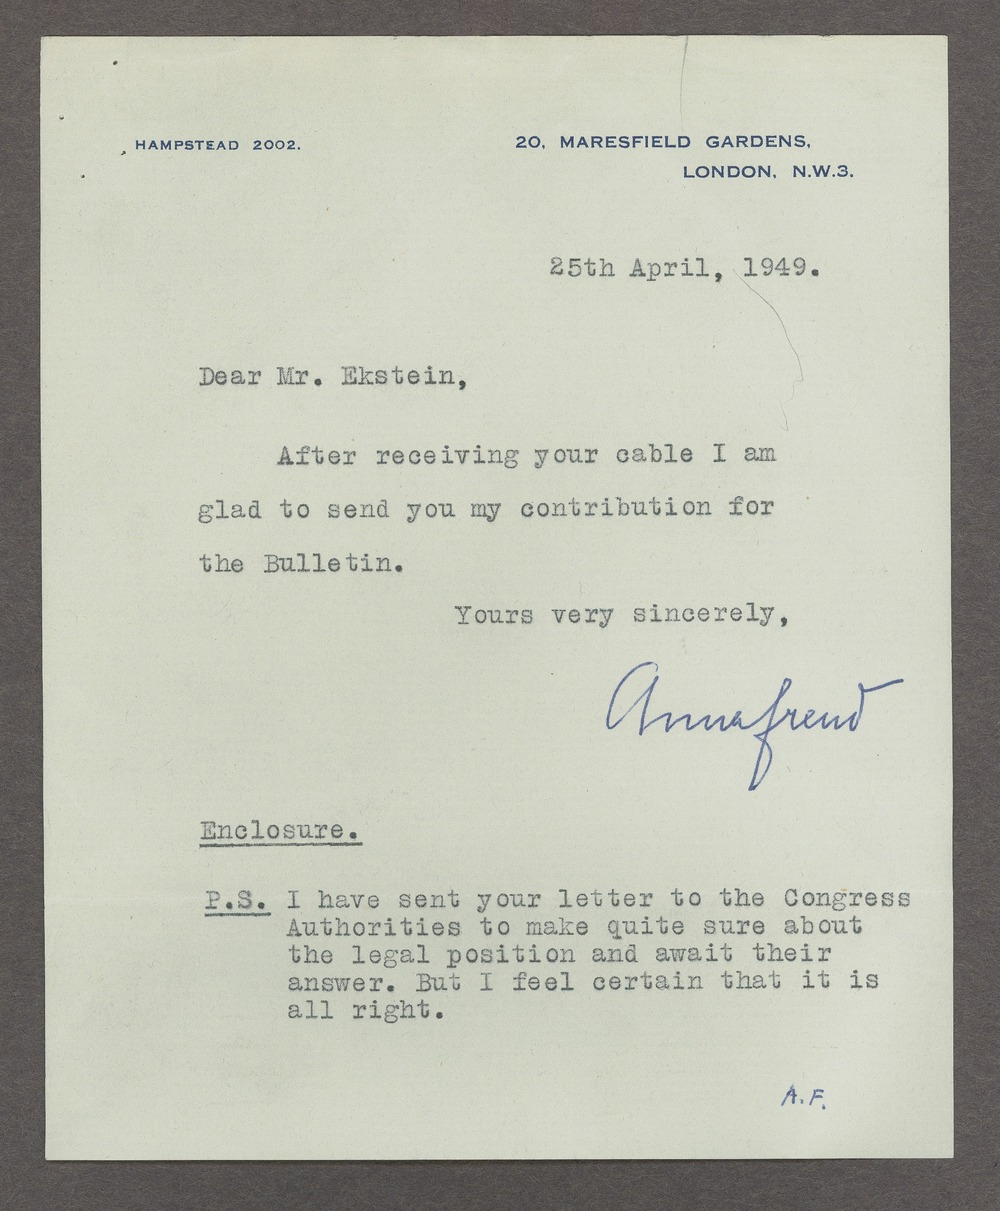 Anna Freud correspondence - Freud, Anna  April 25, 1949 (Box 1, folder 6)